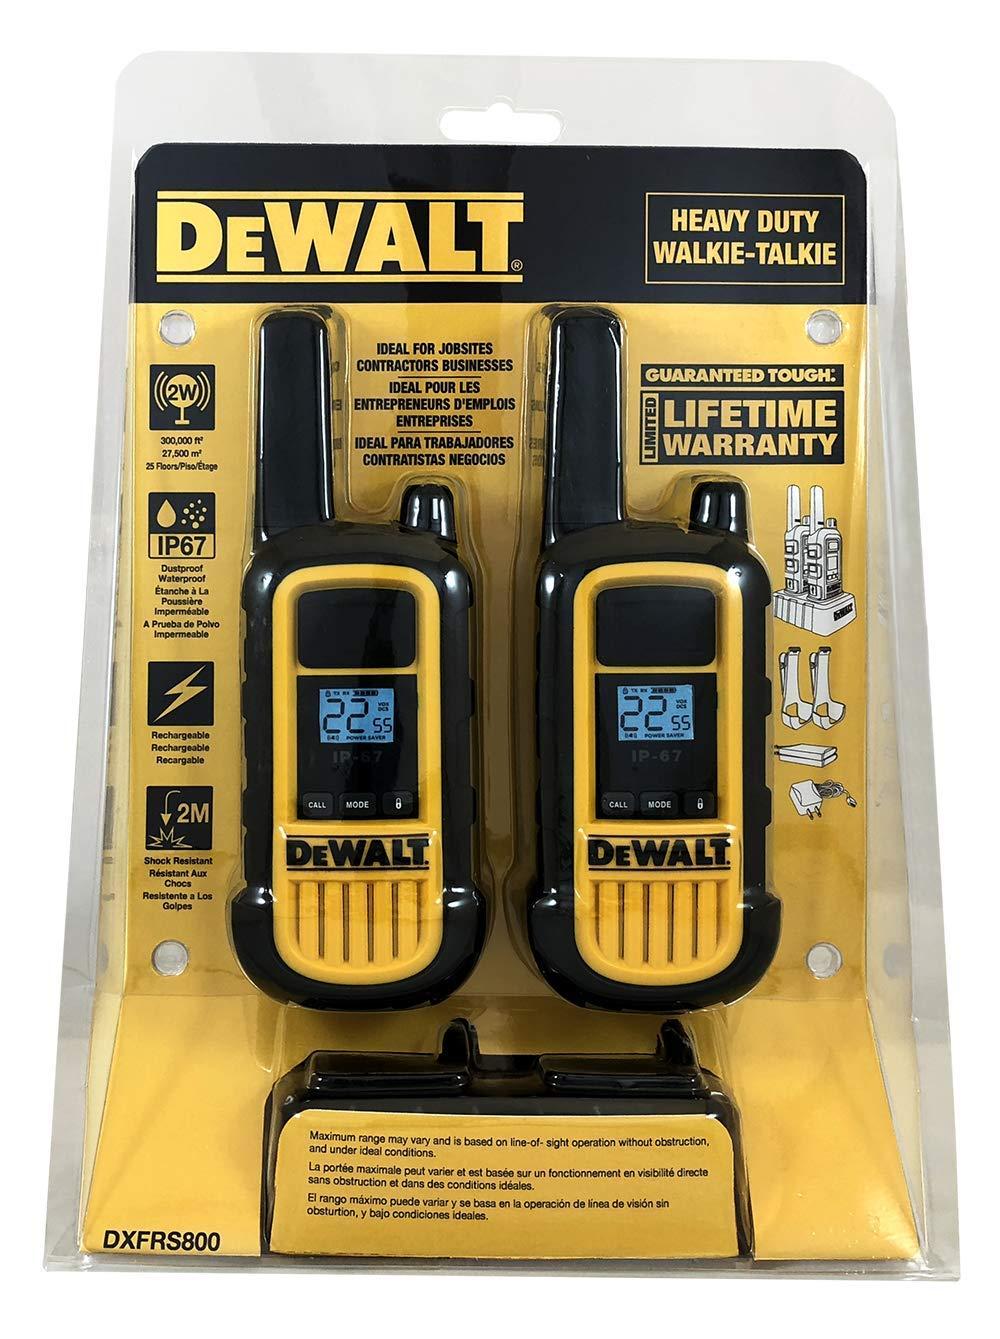 DeWALT DXFRS800 2W Walkie Talkies Heavy Duty Business Two-Way Radios (Pair) by DEWALT (Image #12)